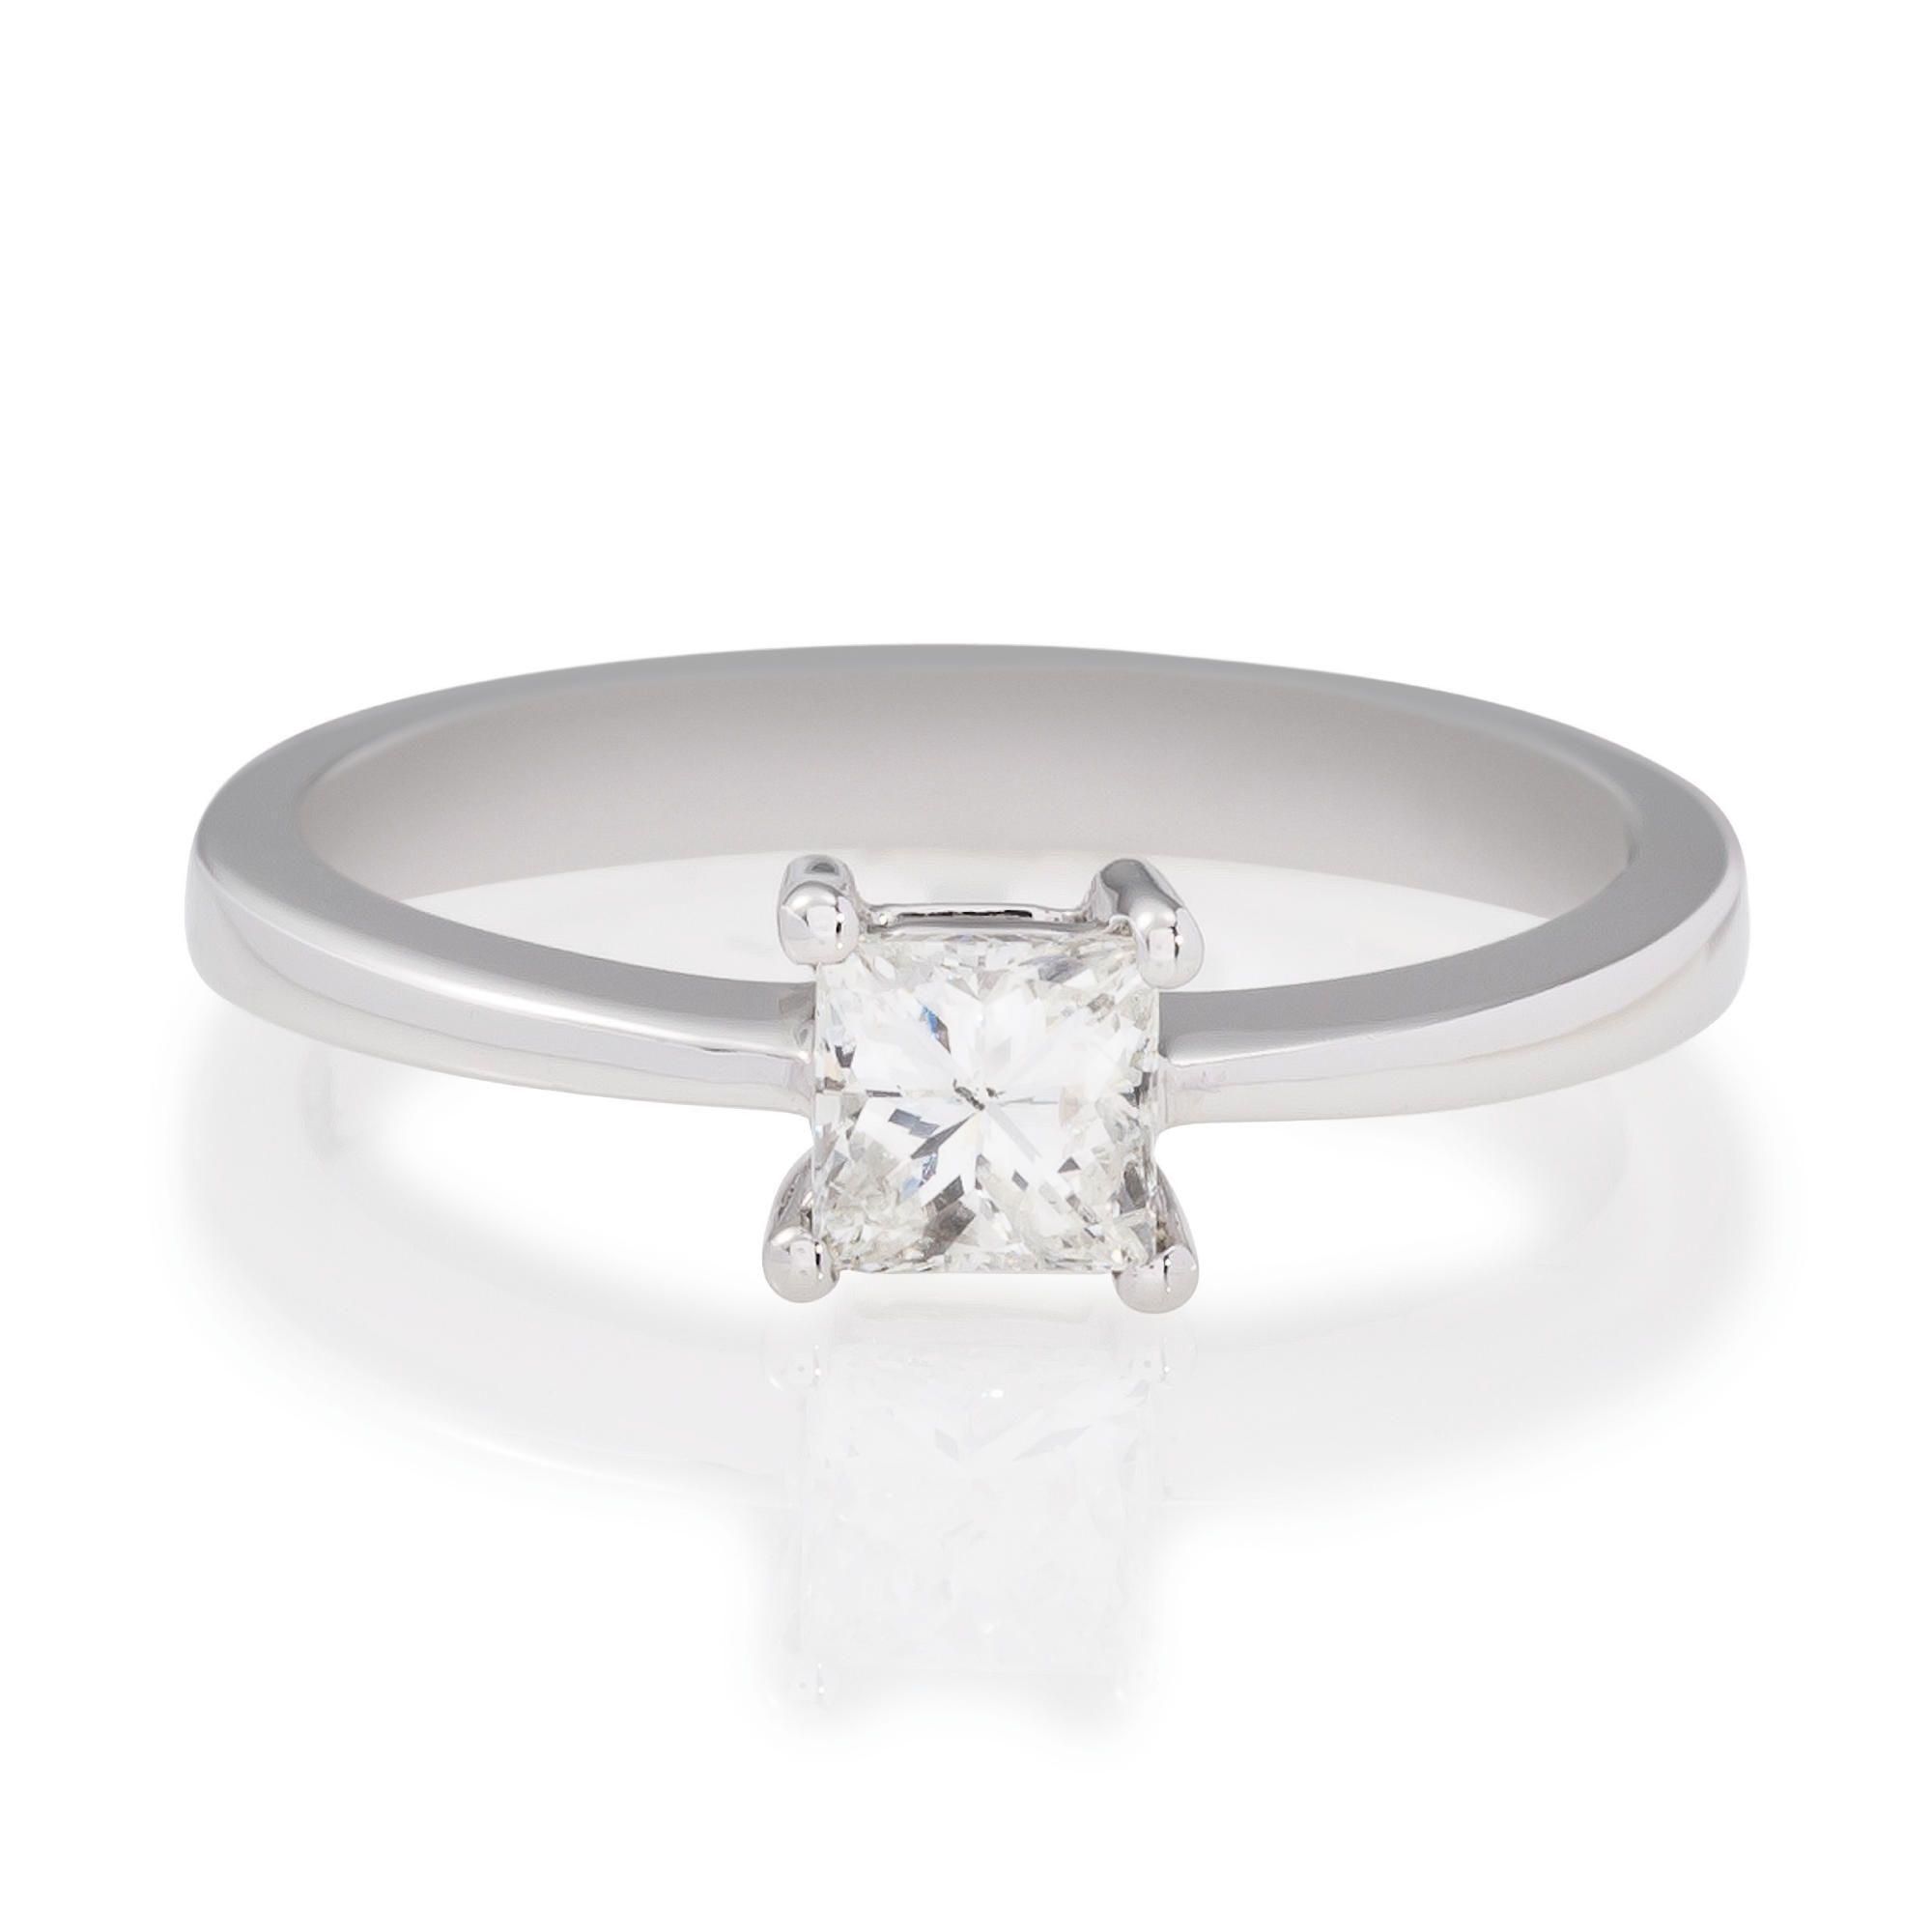 18ct White Gold 50Pt Princess Cut Diamond Ring, P at Tesco Direct